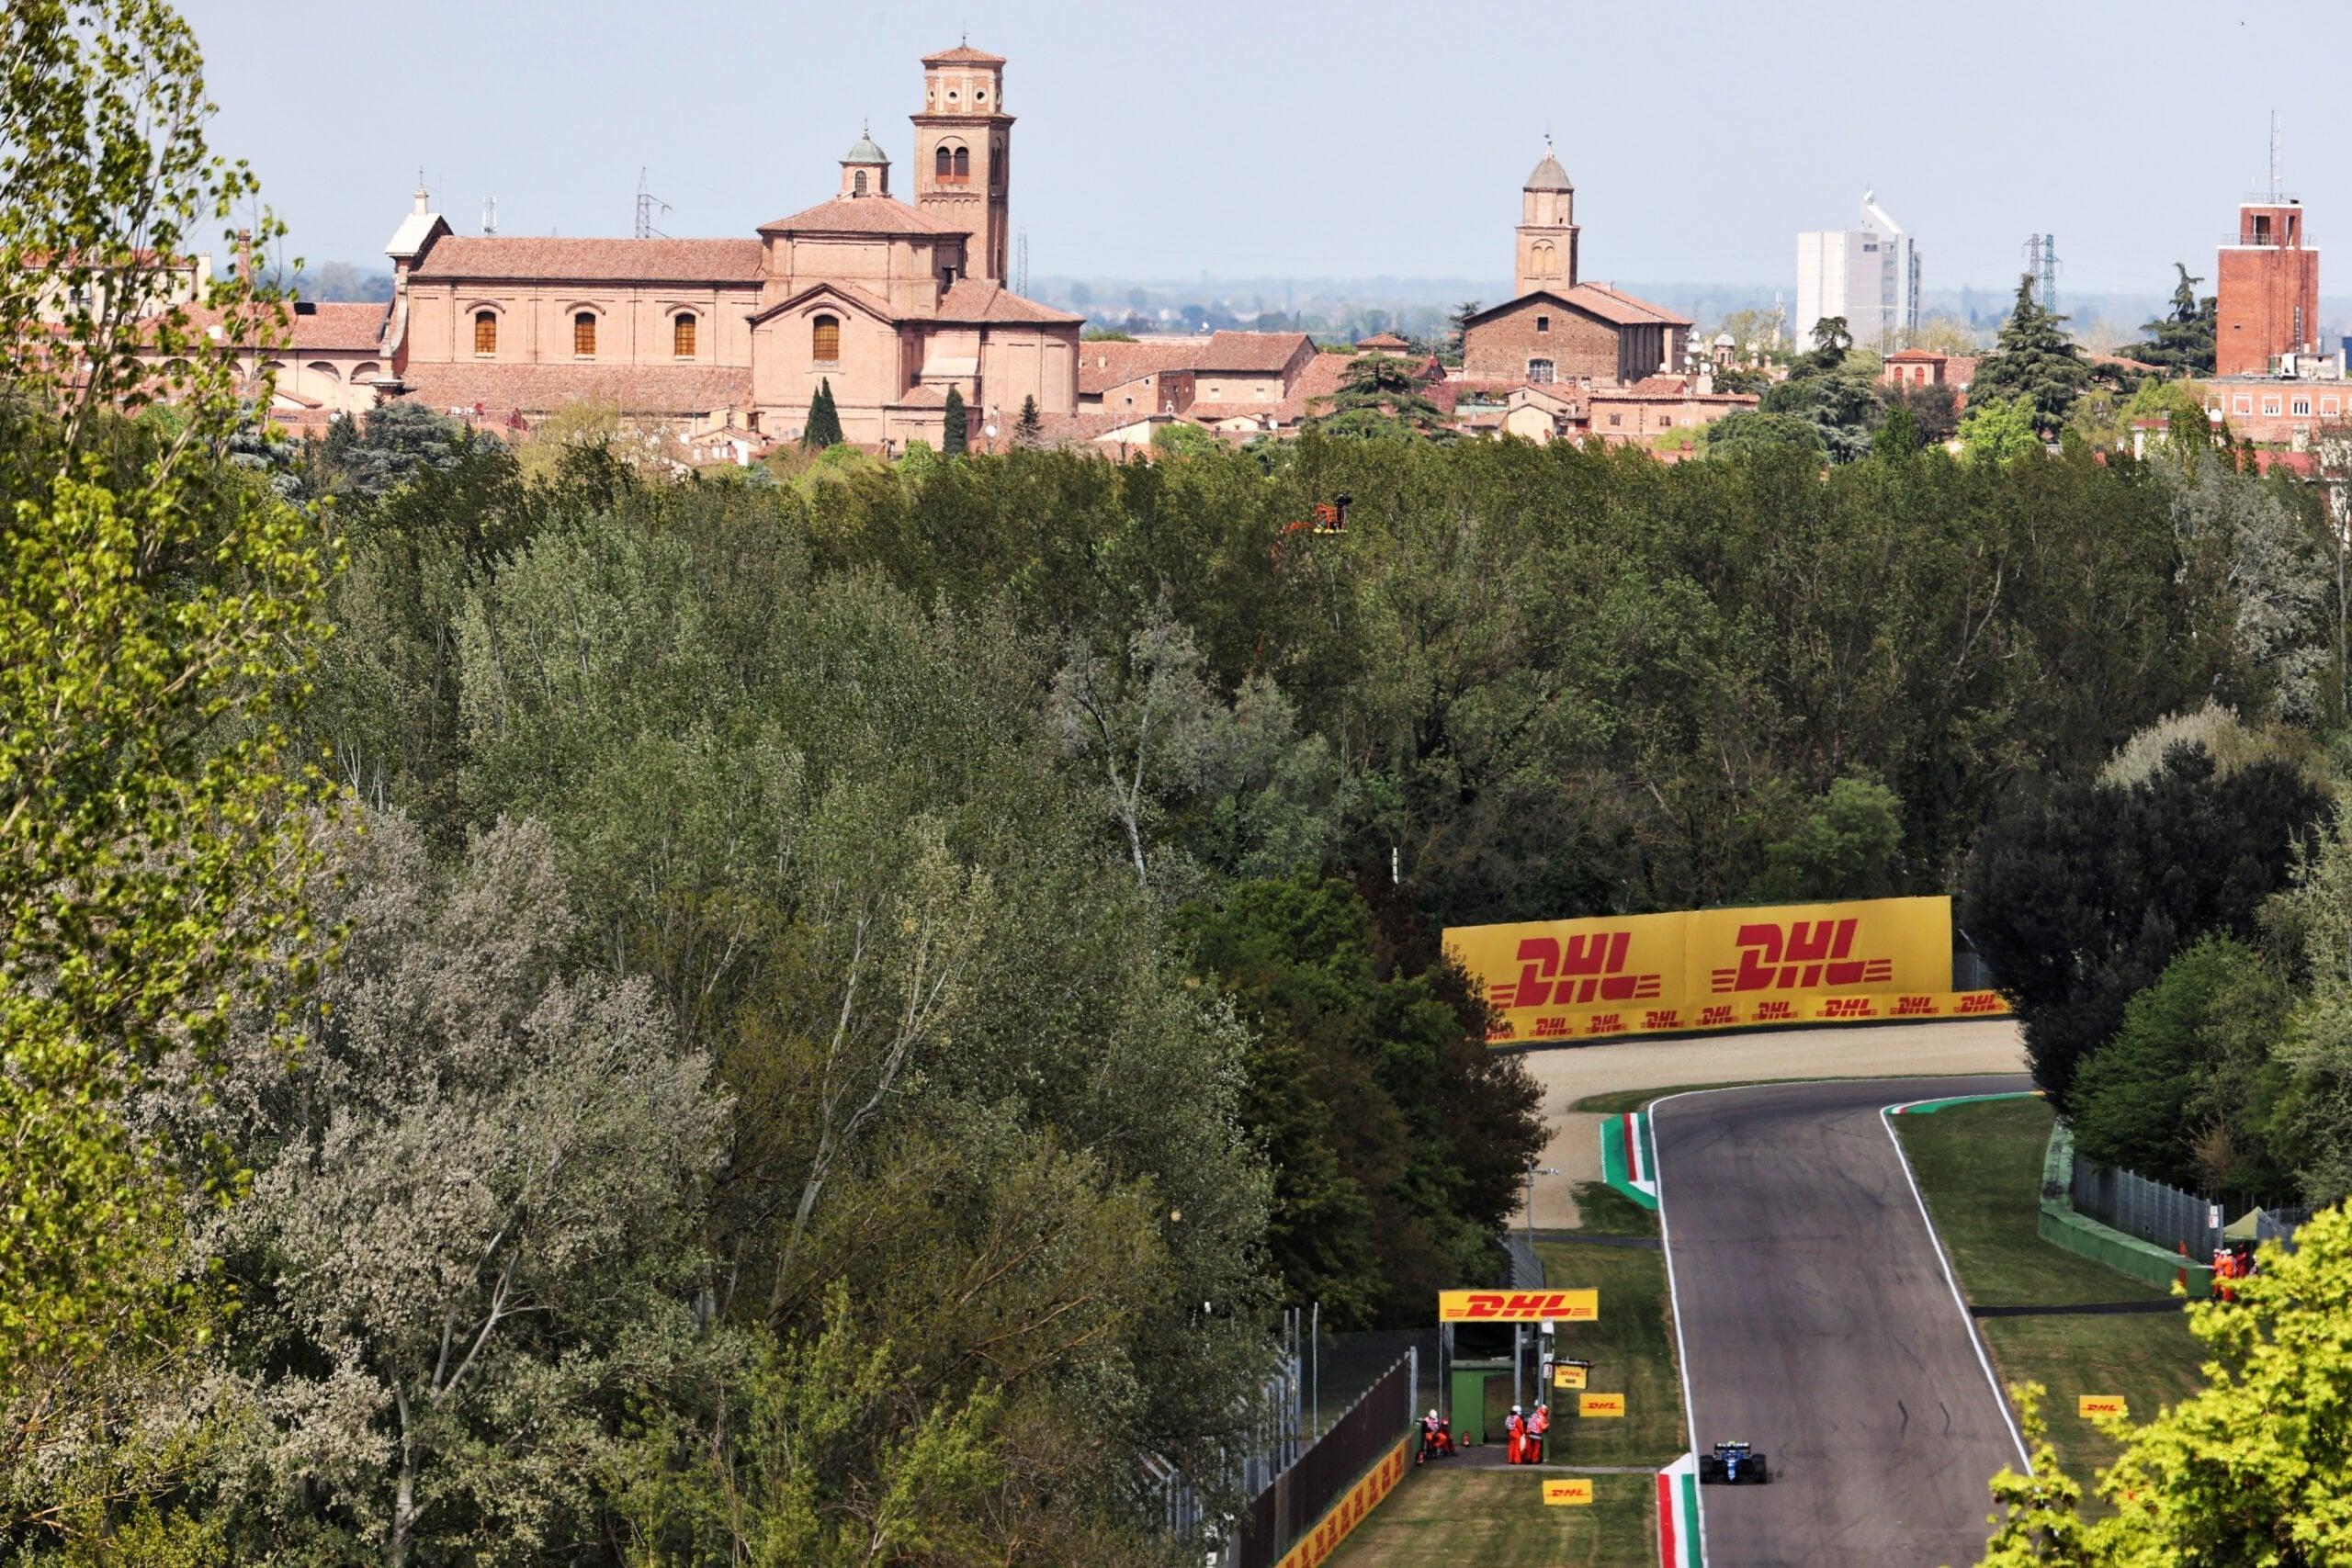 Alpine F1 Team A521 Alonso Ocon Brivio Permane Imola 2021 Test 8 scaled   Alpine F1 Team : Ocon en Q3 et Alonso en Q2 au GP d'Emilie Romagne